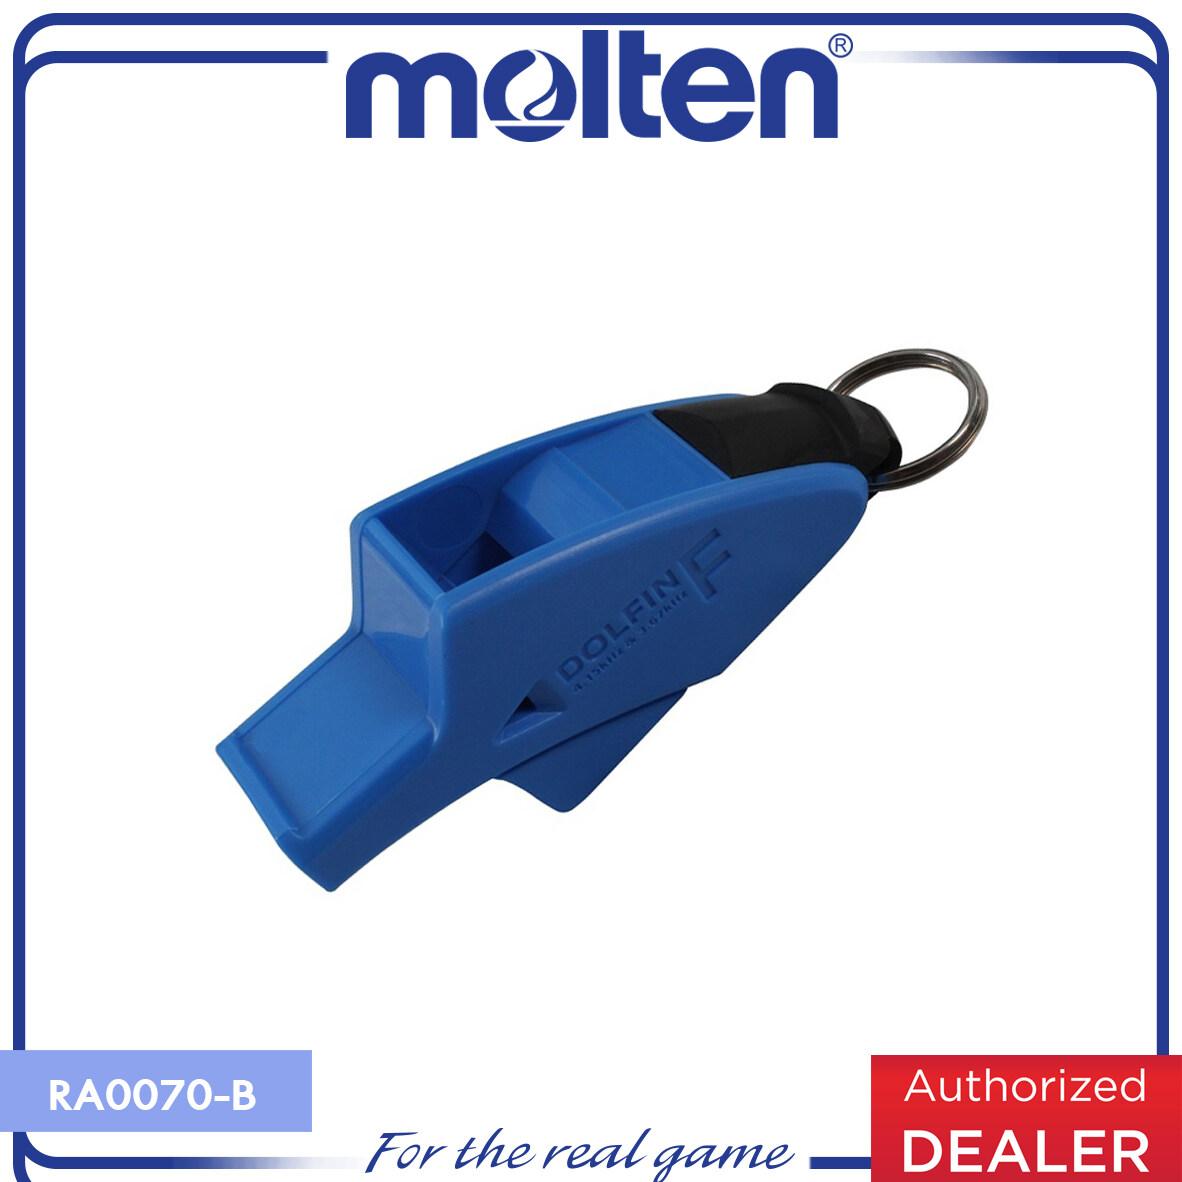 Molten นกหวีด Referee Whistle Football Jp Ra0070-B(410).